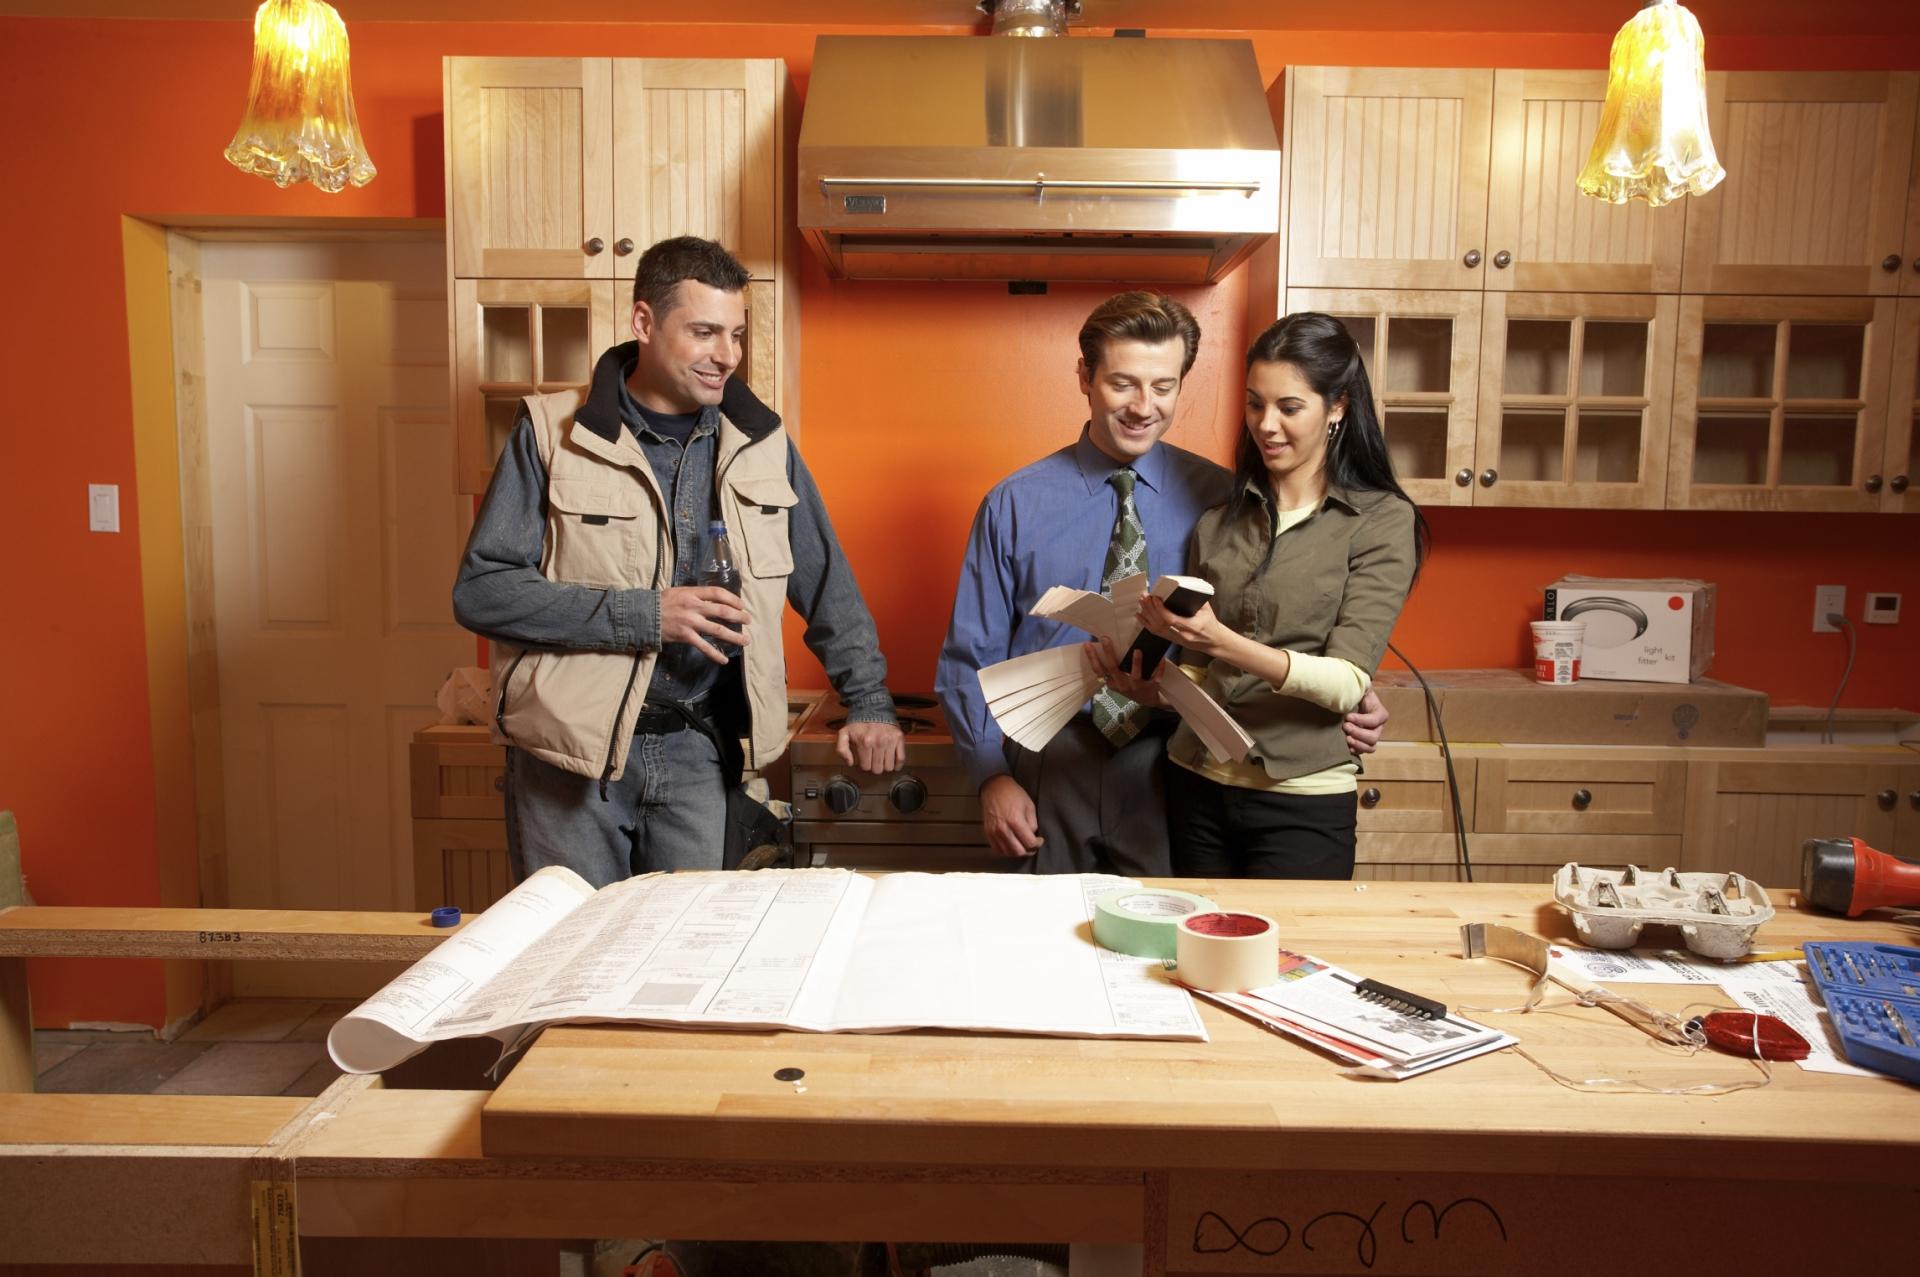 about home renovation 3 همه چیز درباره بازسازی منزل